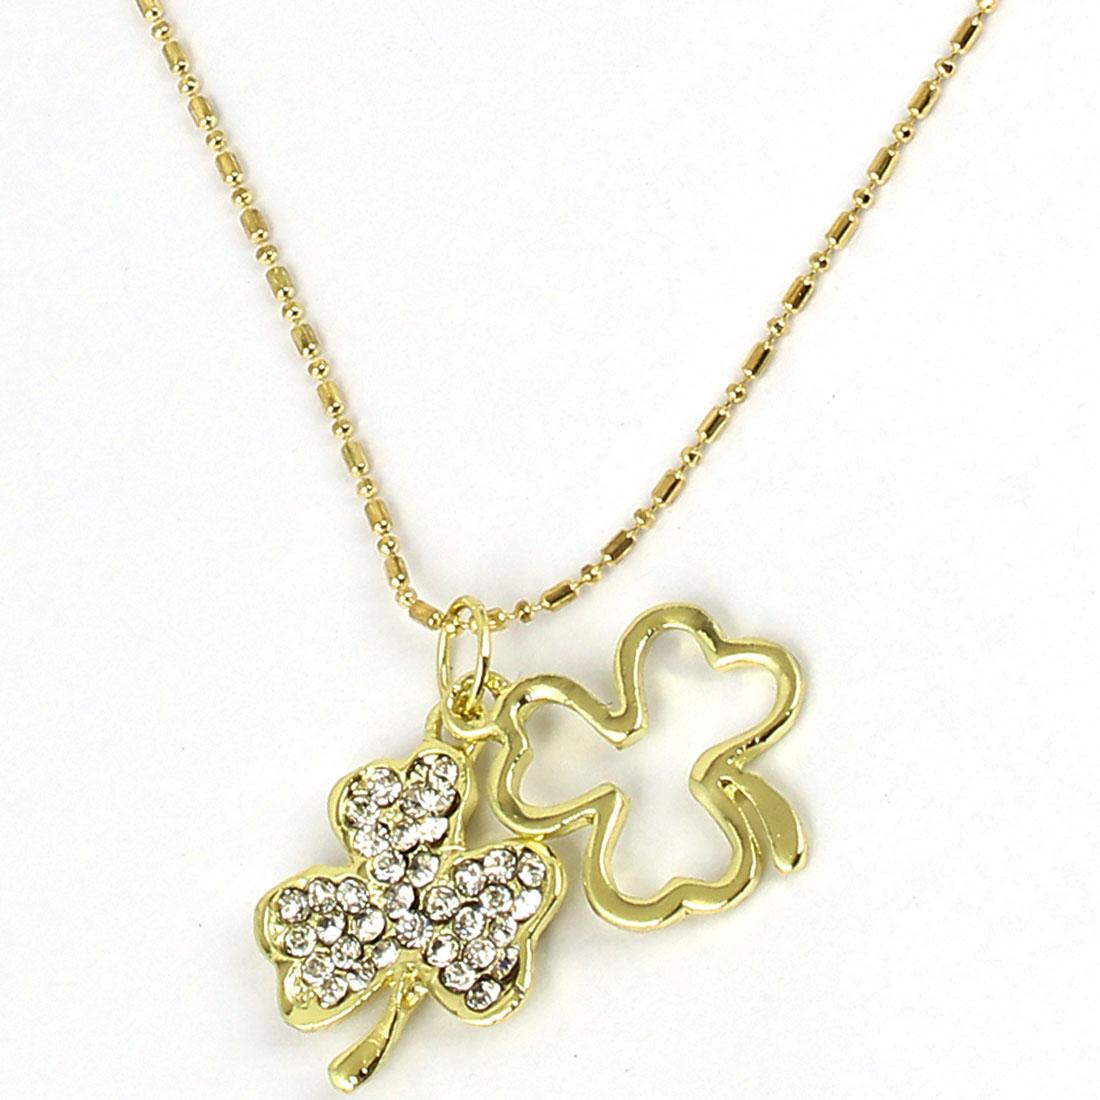 Women Shinning Rhinestone Bead Pendant Necklace Jewelry Gift